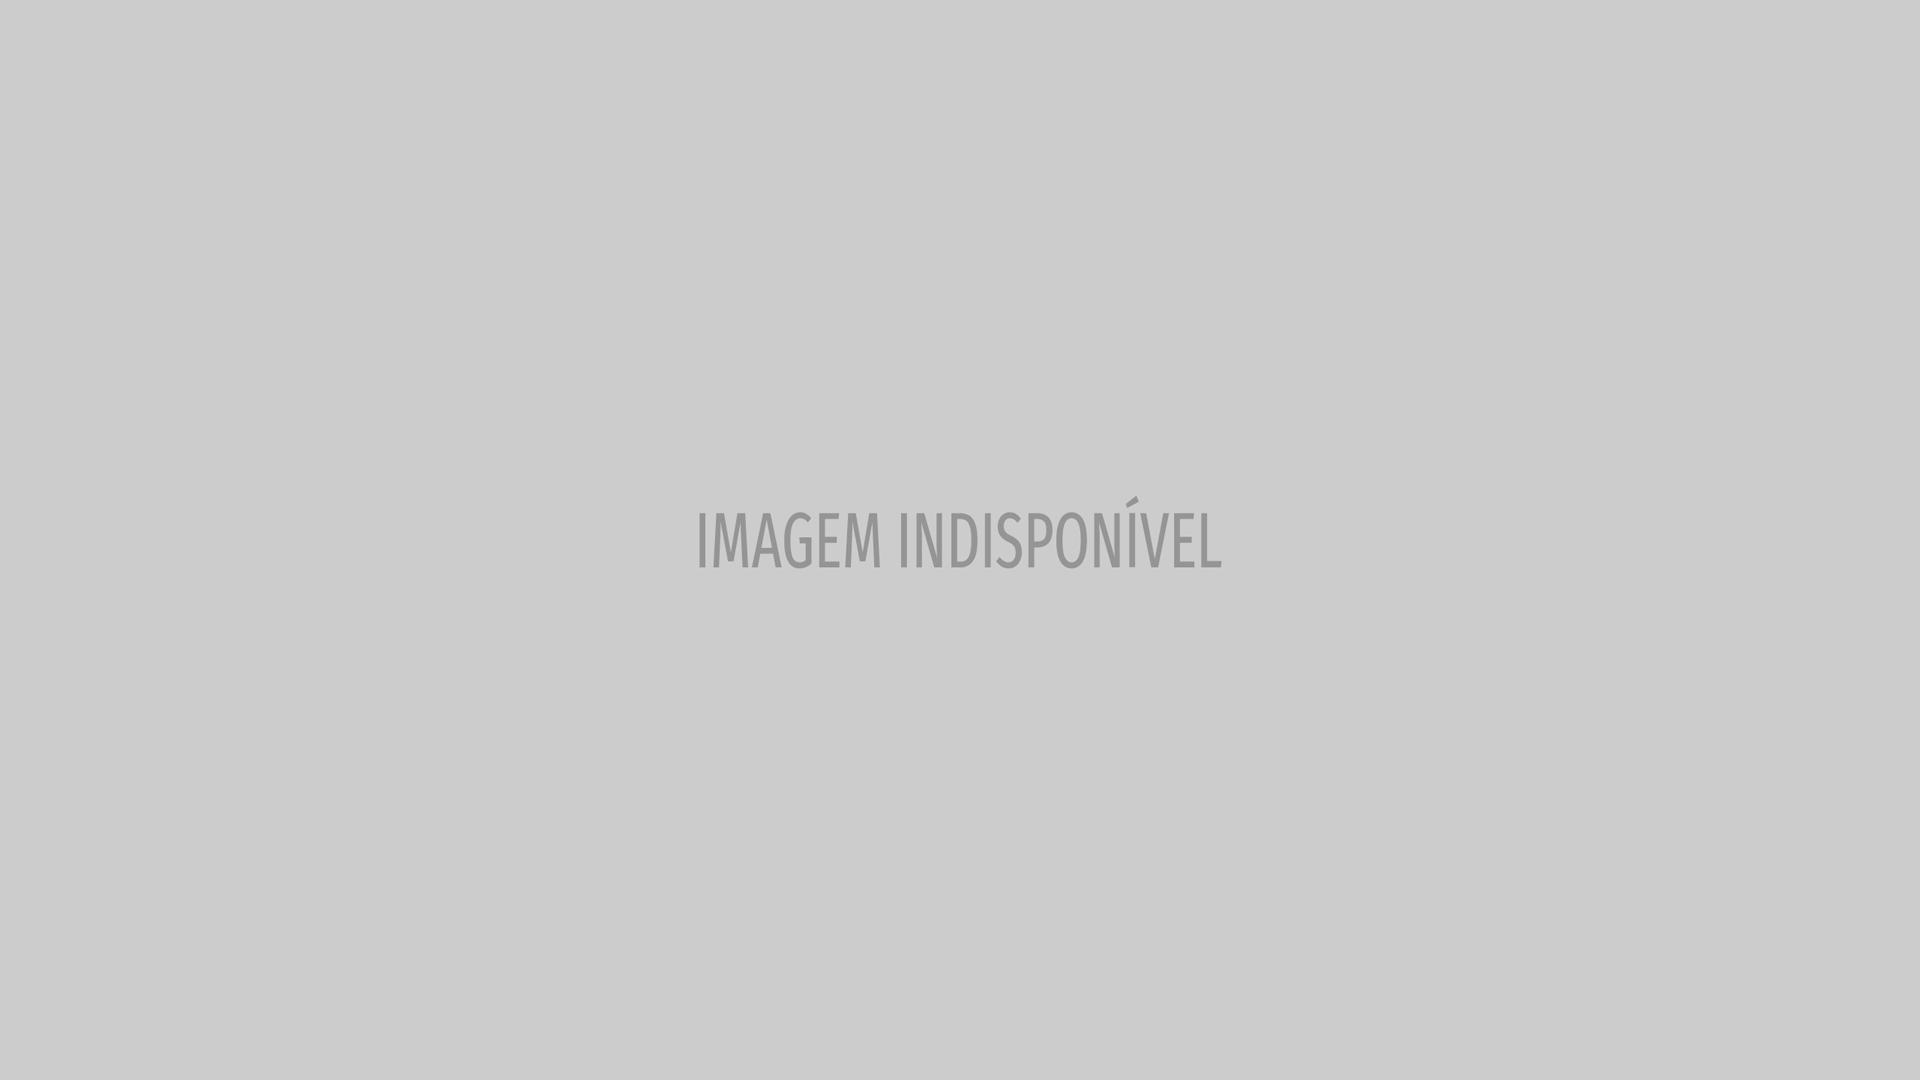 Rita Ferro Rodrigues reage aos rumores sobre o seu futuro profissional